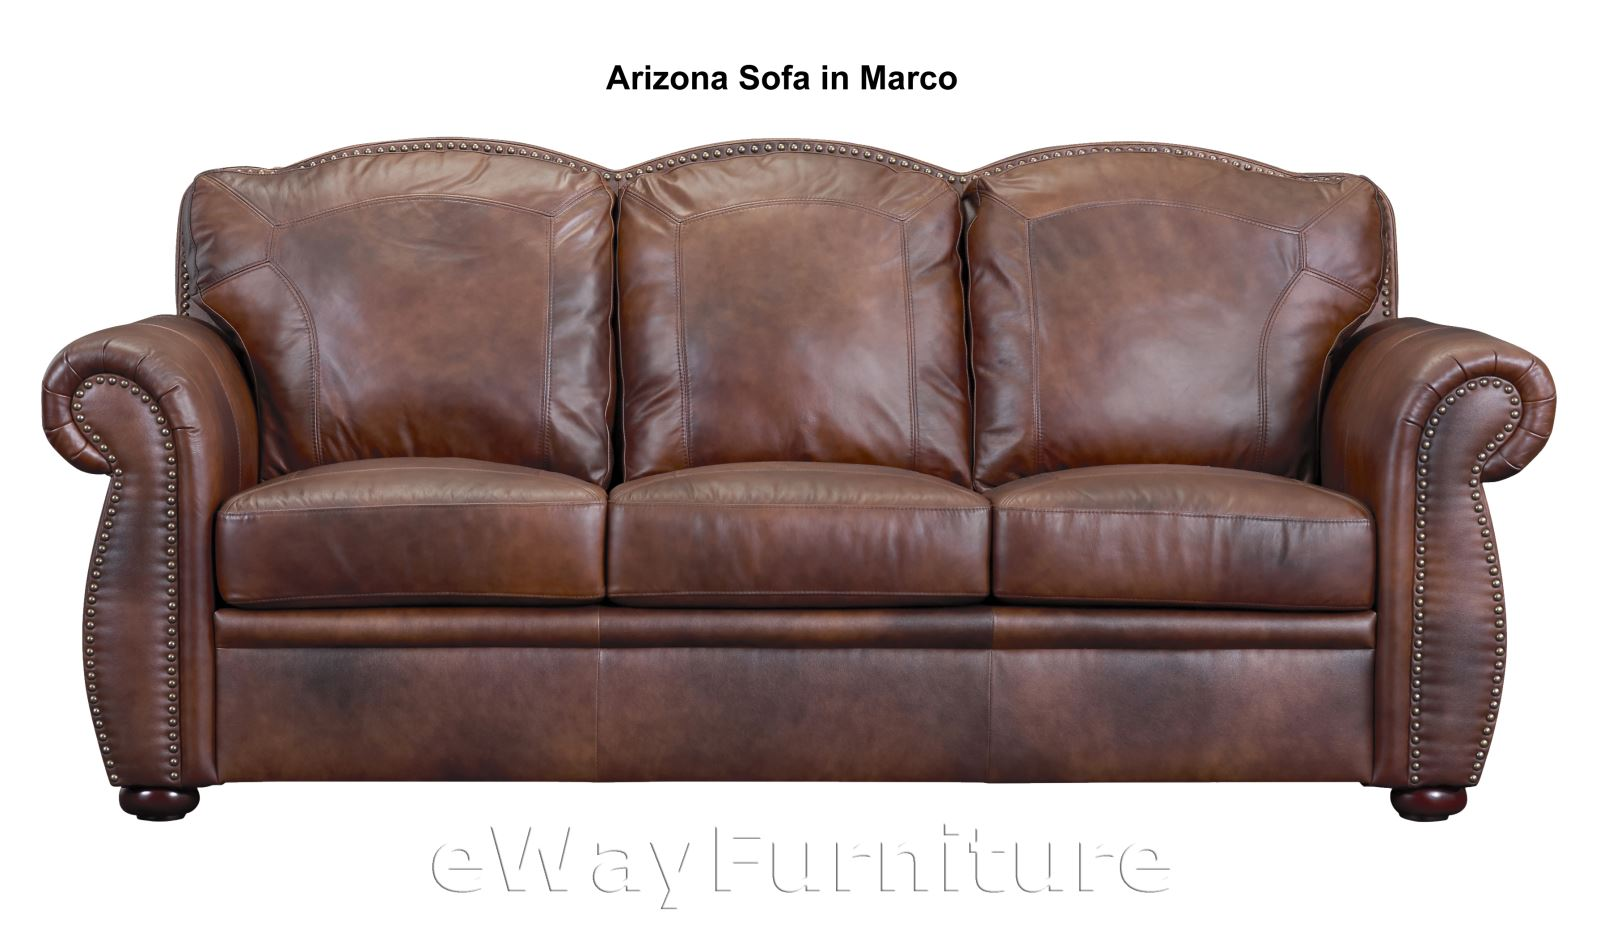 Arizona Top Grain Leather Sofa In Marco